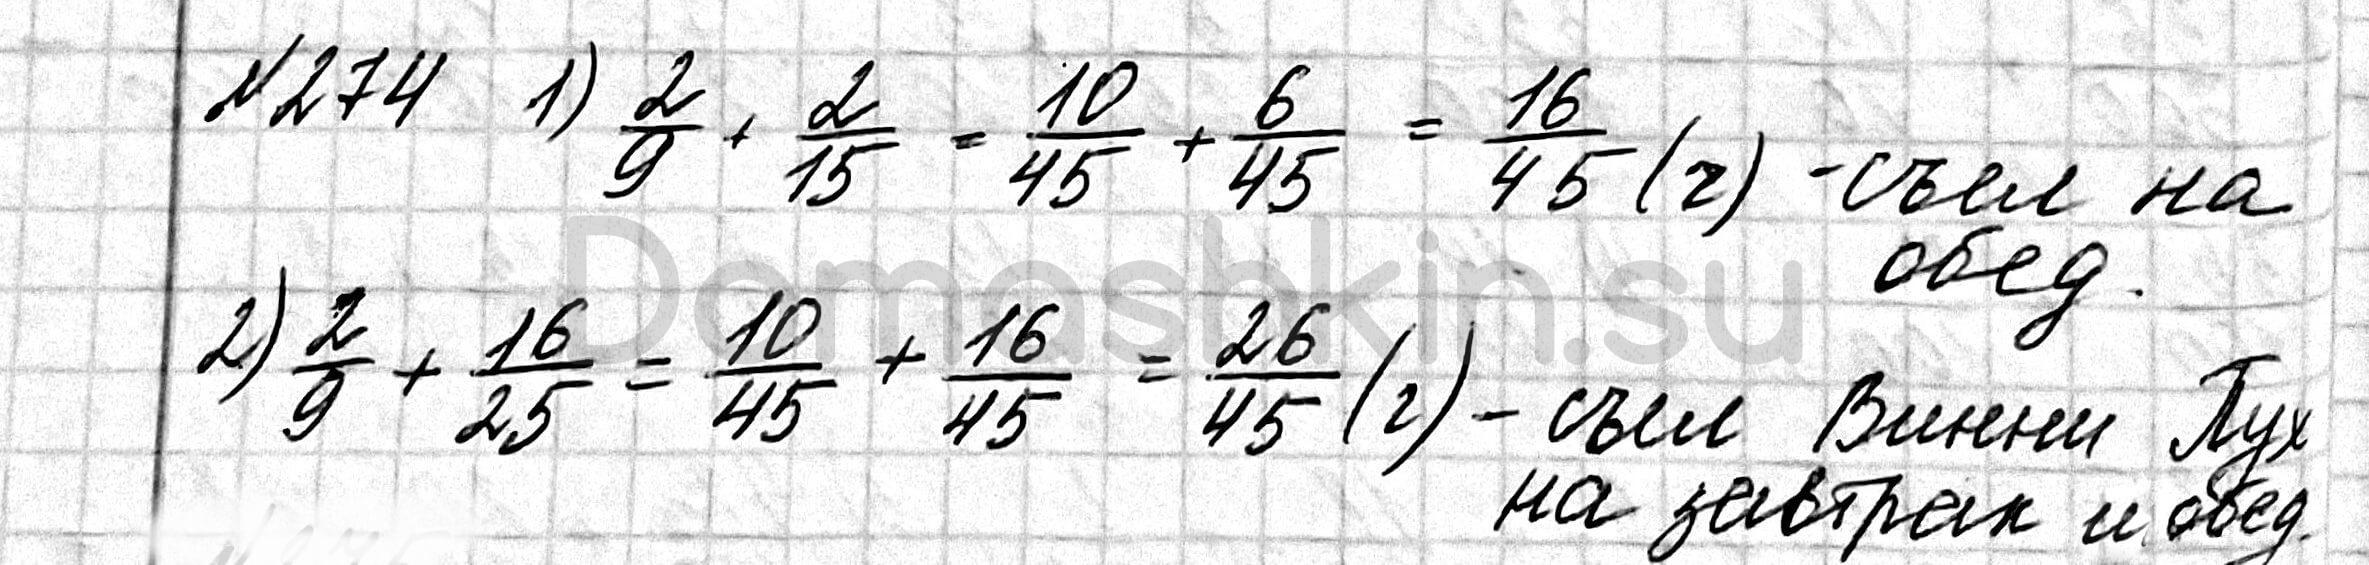 Математика 6 класс учебник Мерзляк номер 274 решение